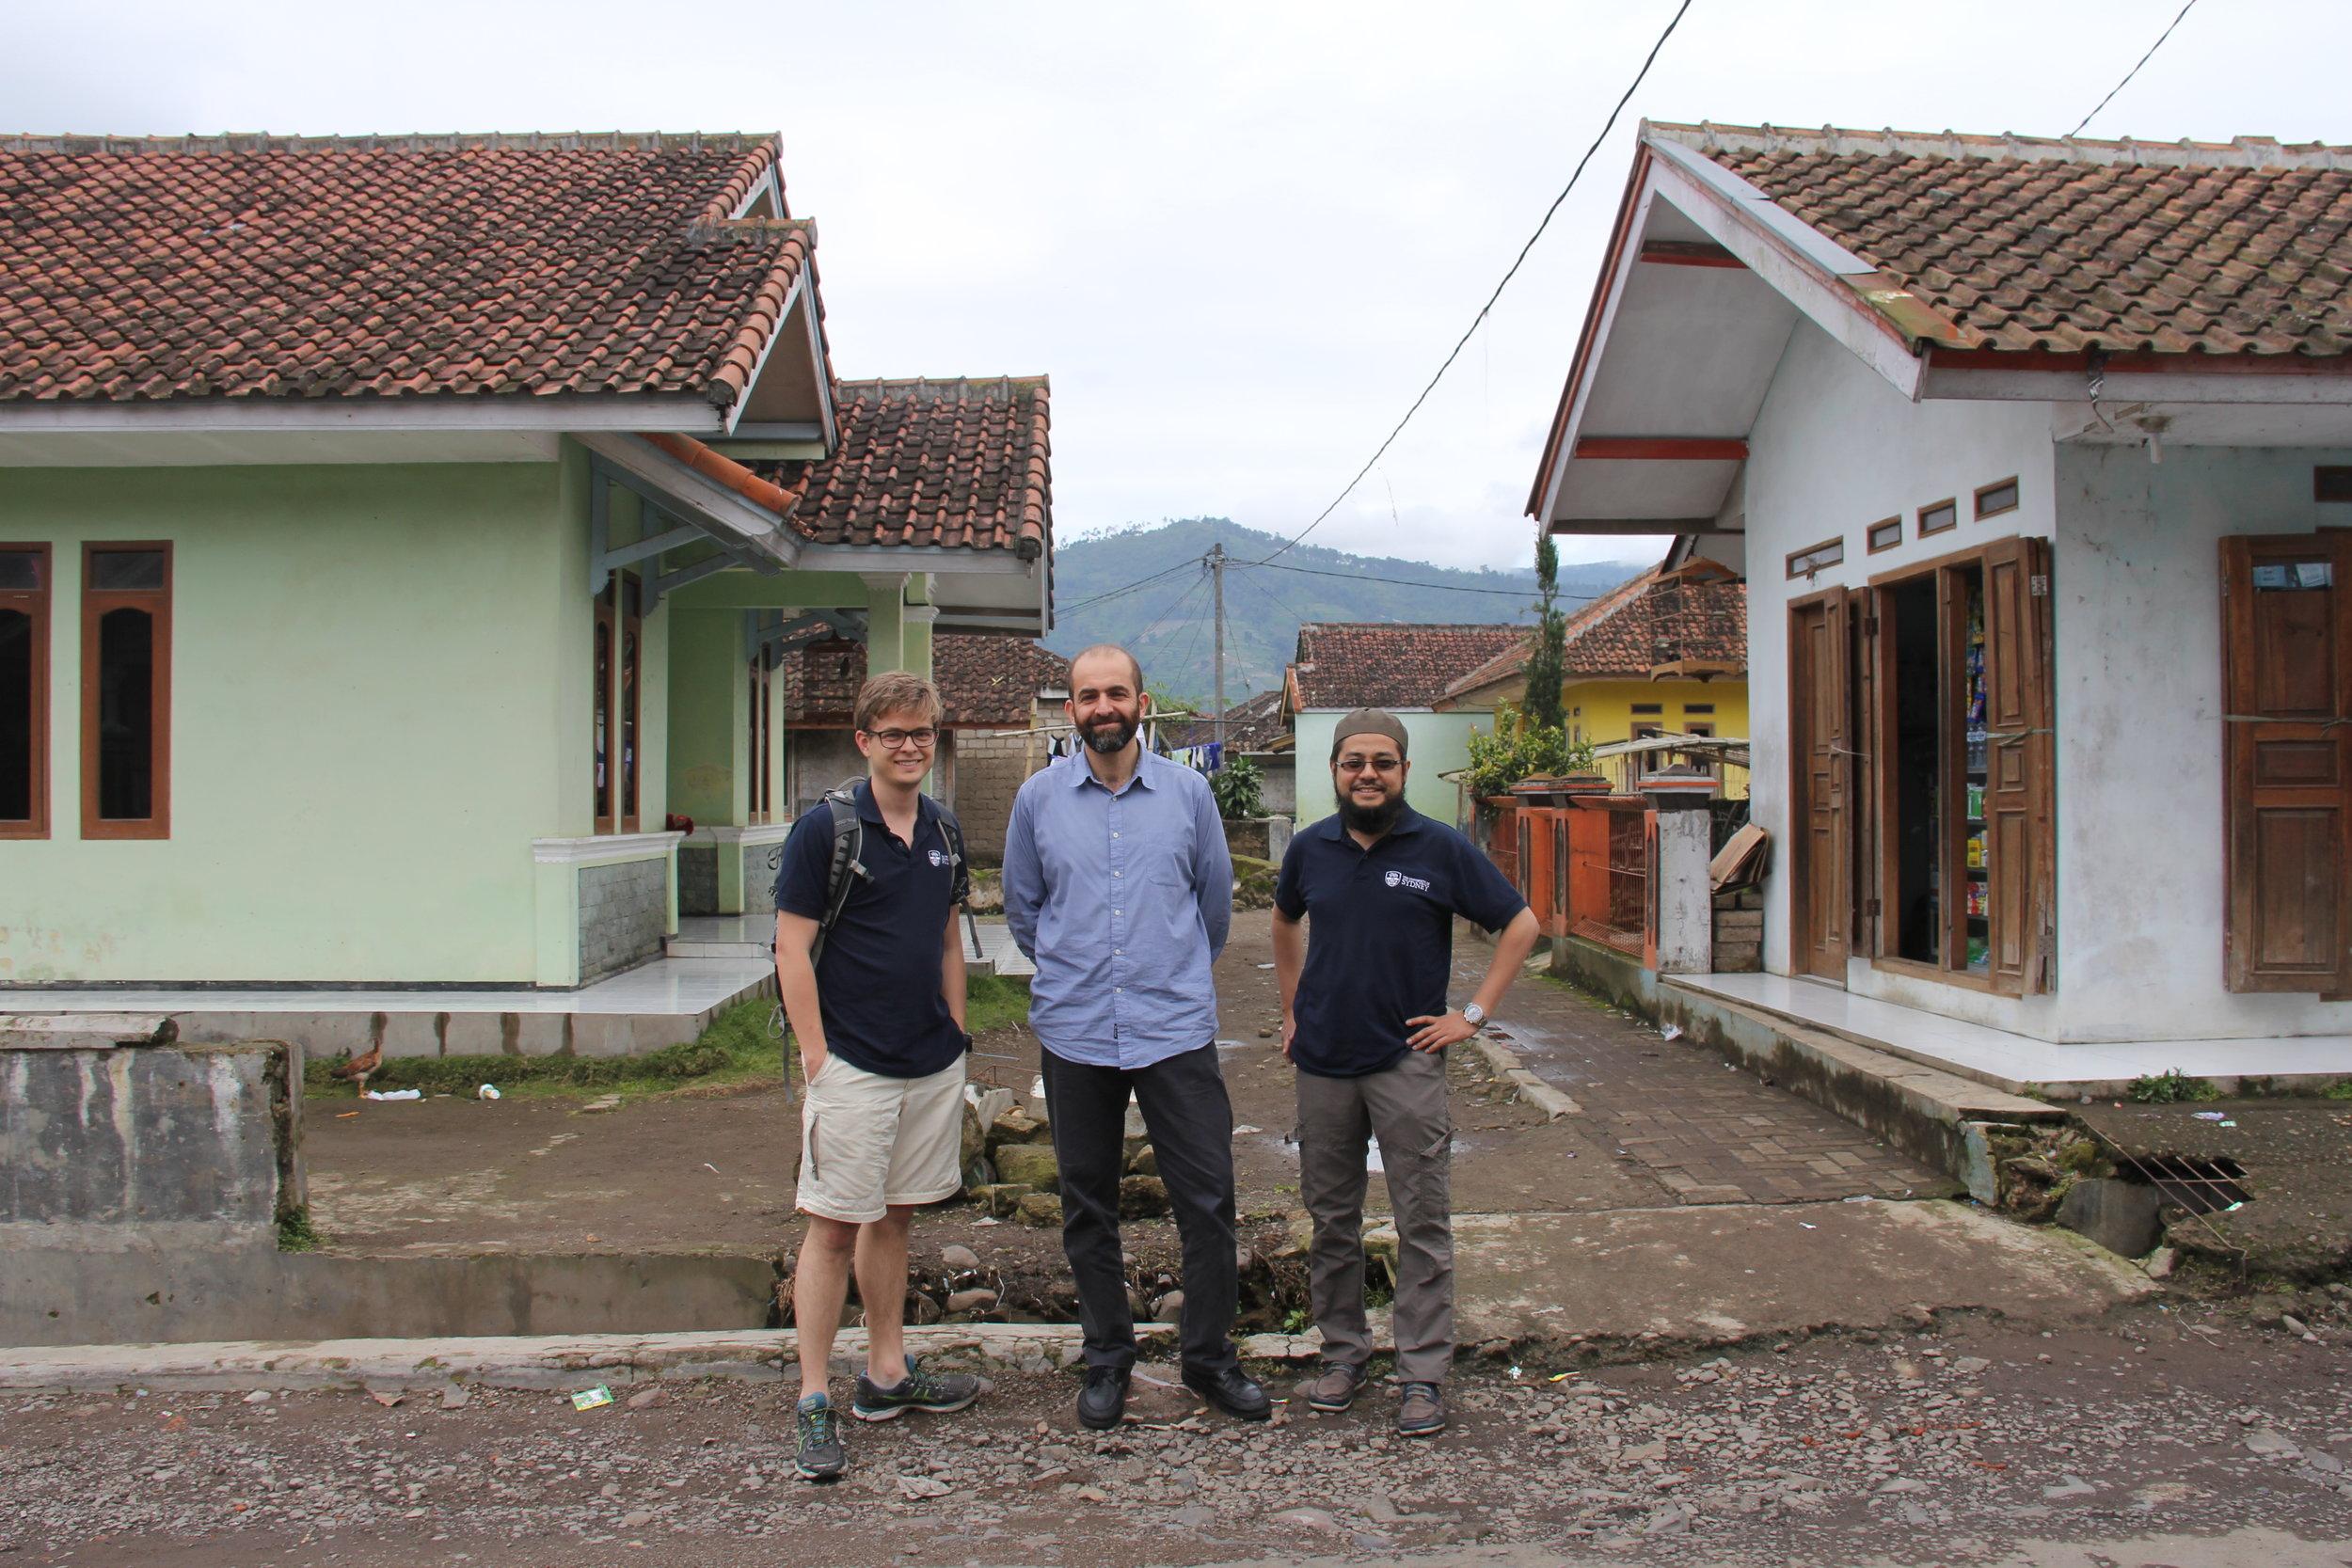 The ACFR team from left to right. William Reid, Salah Sukkarieh, Muhammad Esa Attia